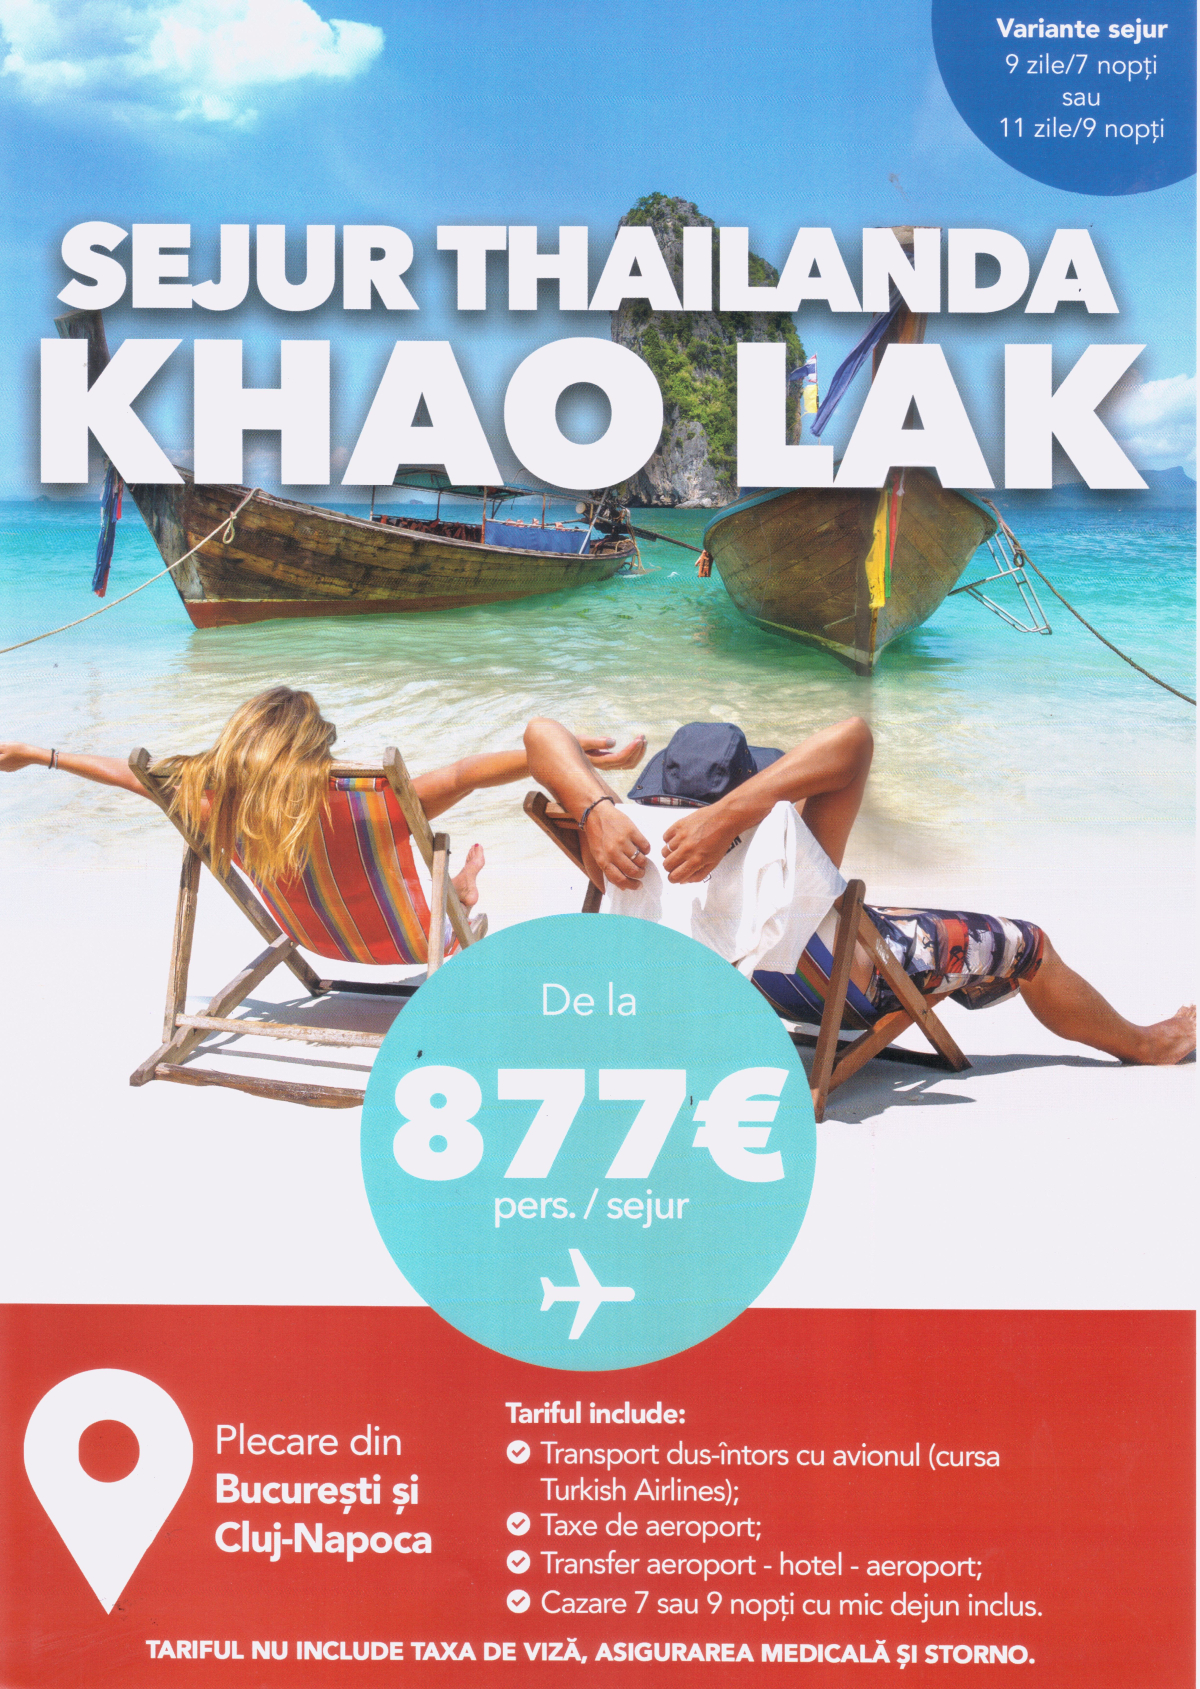 Sejur Khao Lak Thailanda